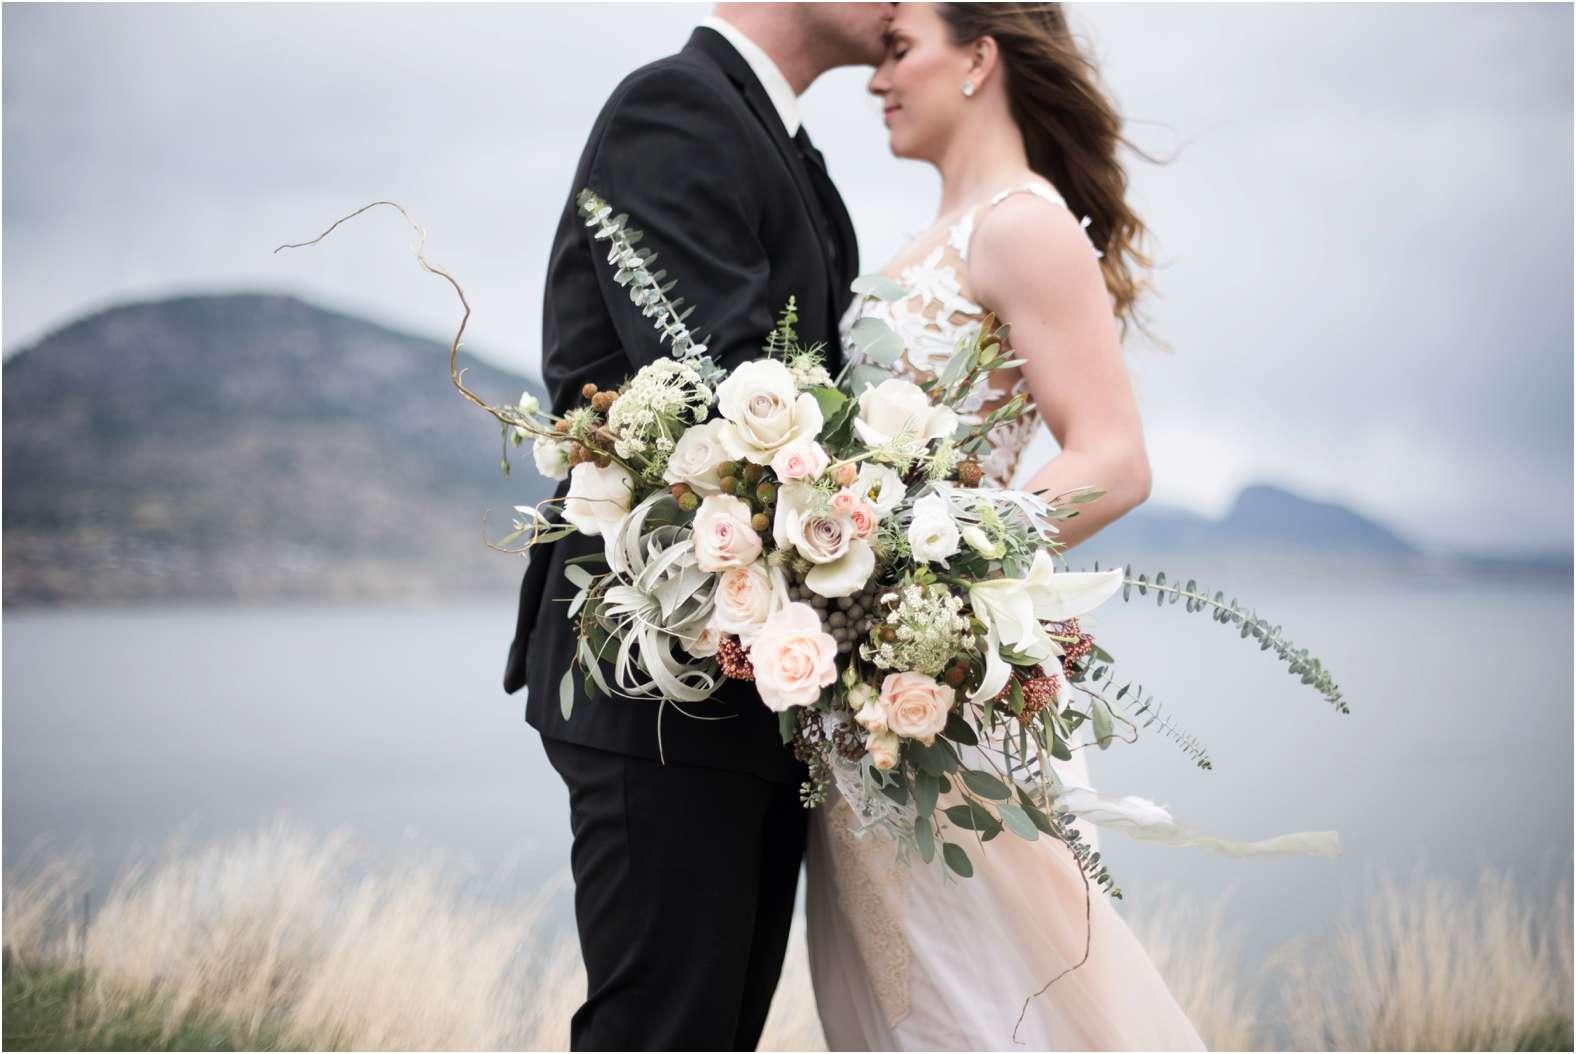 Naramata-wedding-janelle-8.jpg